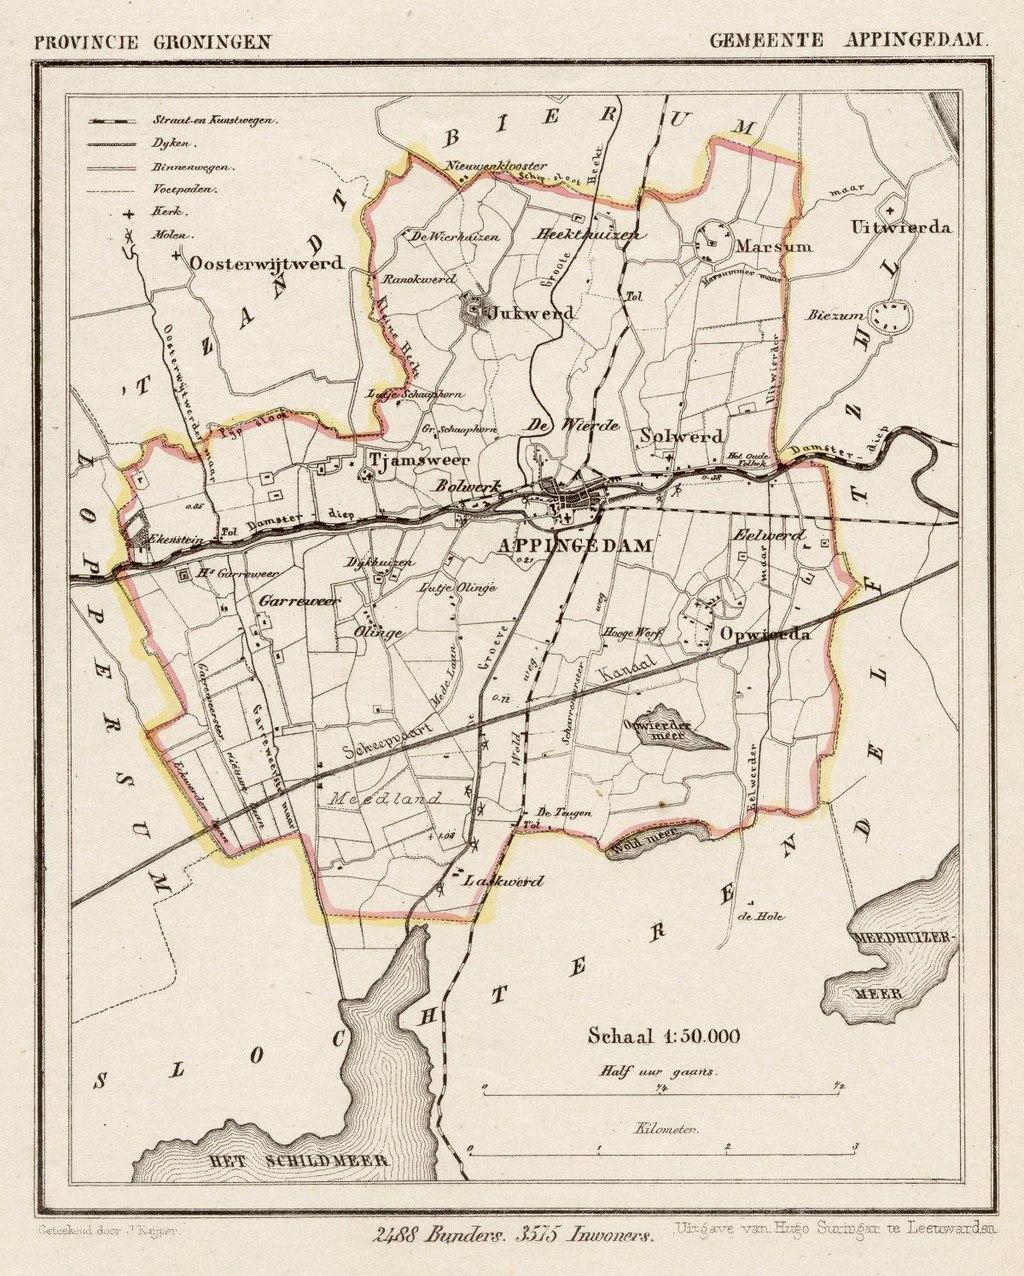 1024px-Netherlands%2C_Appingedam_%28Jukwerd%2C_Marsum%2C_Opwierda%2C_Solwerd%2C_Tjamsweer%29%2C_map%2C_around_1865-1870.jpg